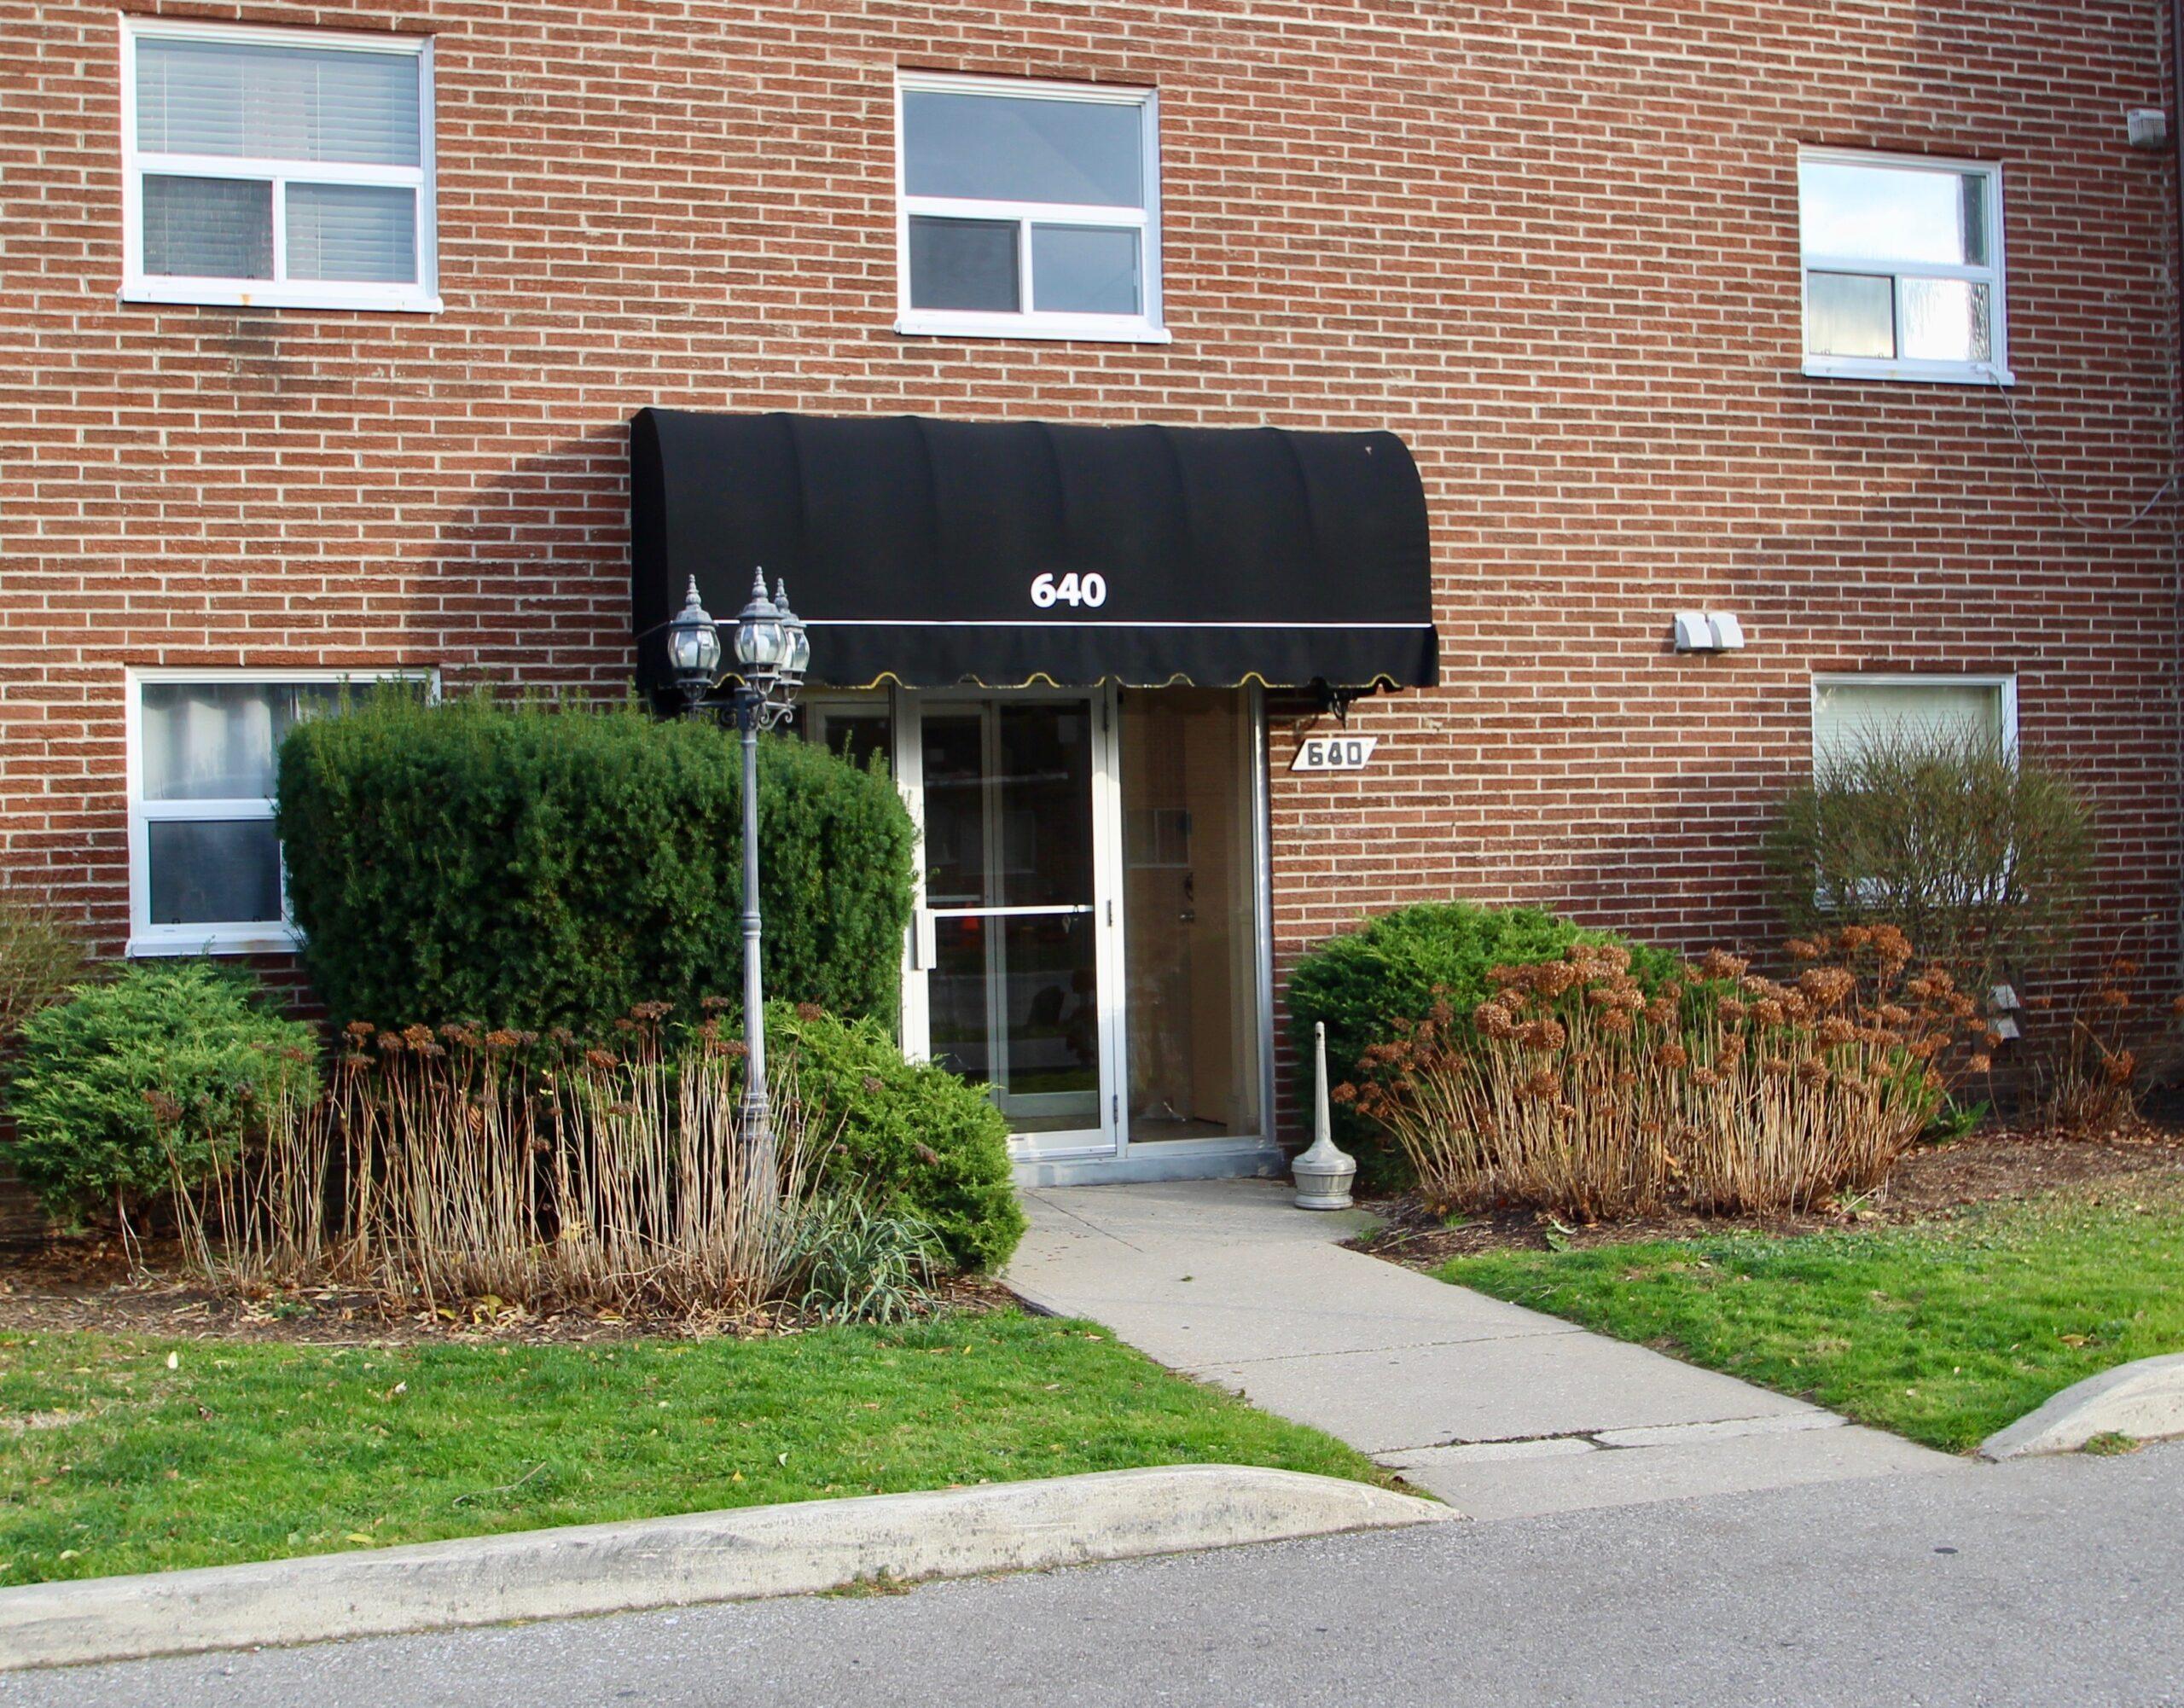 306-640 Grey St.